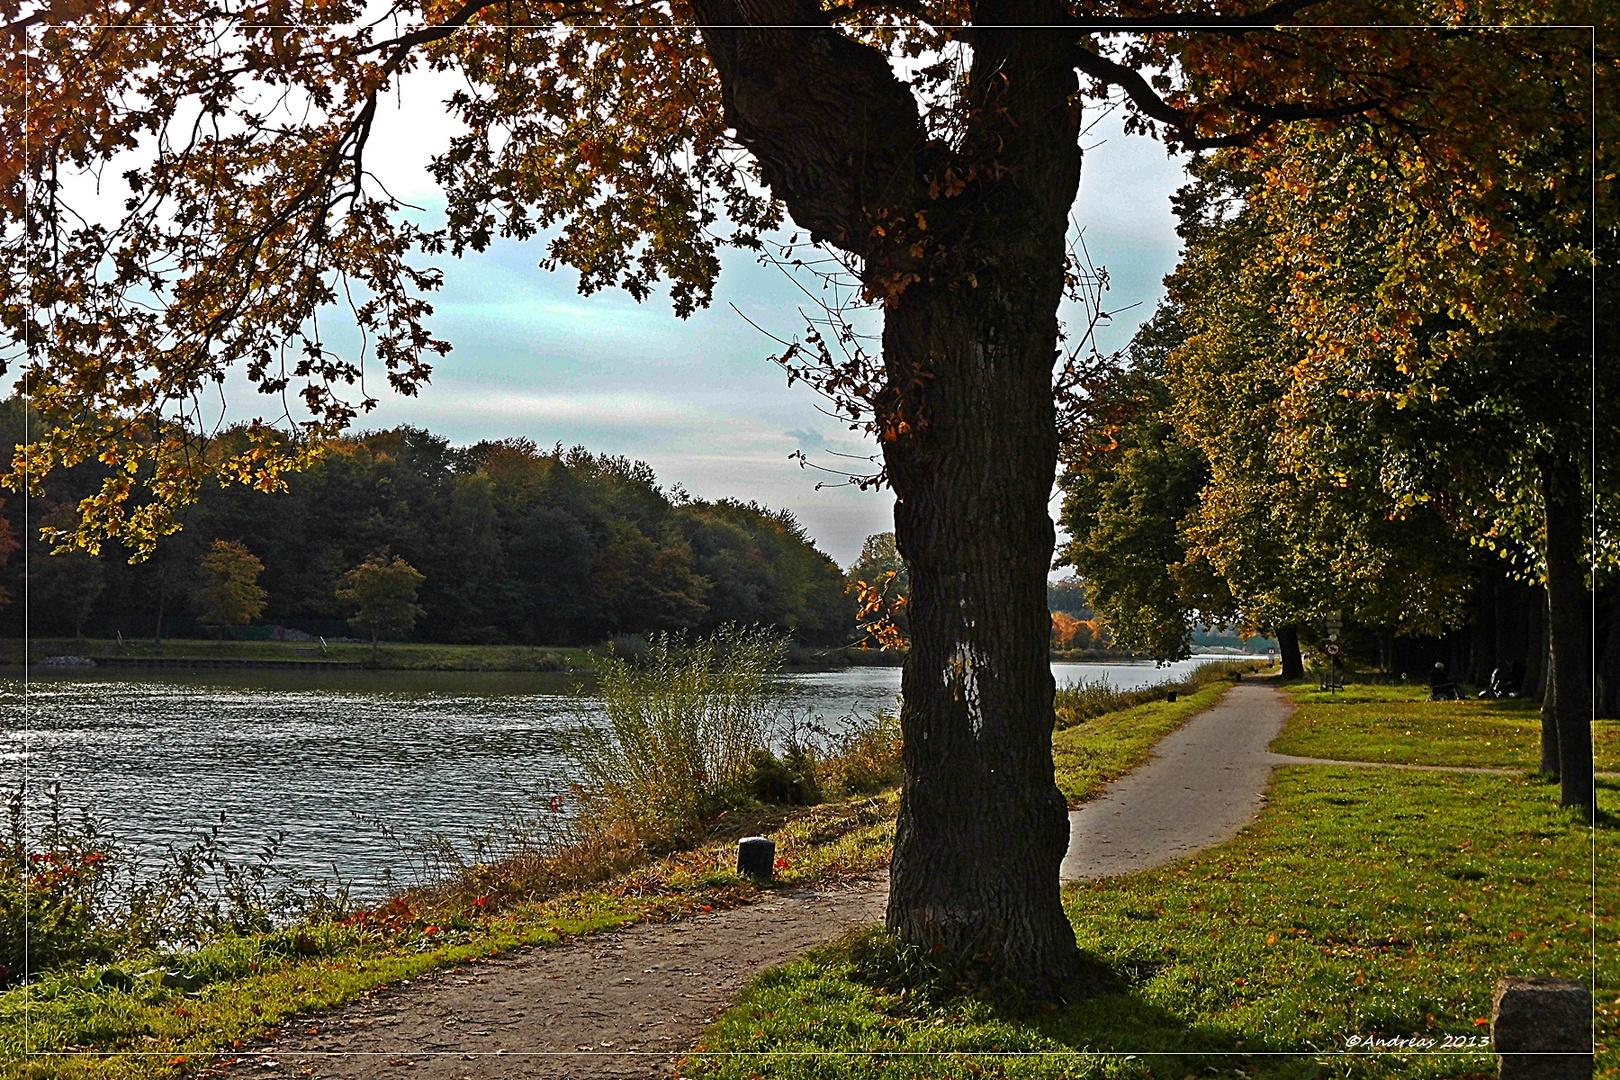 Am Dortmund- Ems- Kanal in Senden